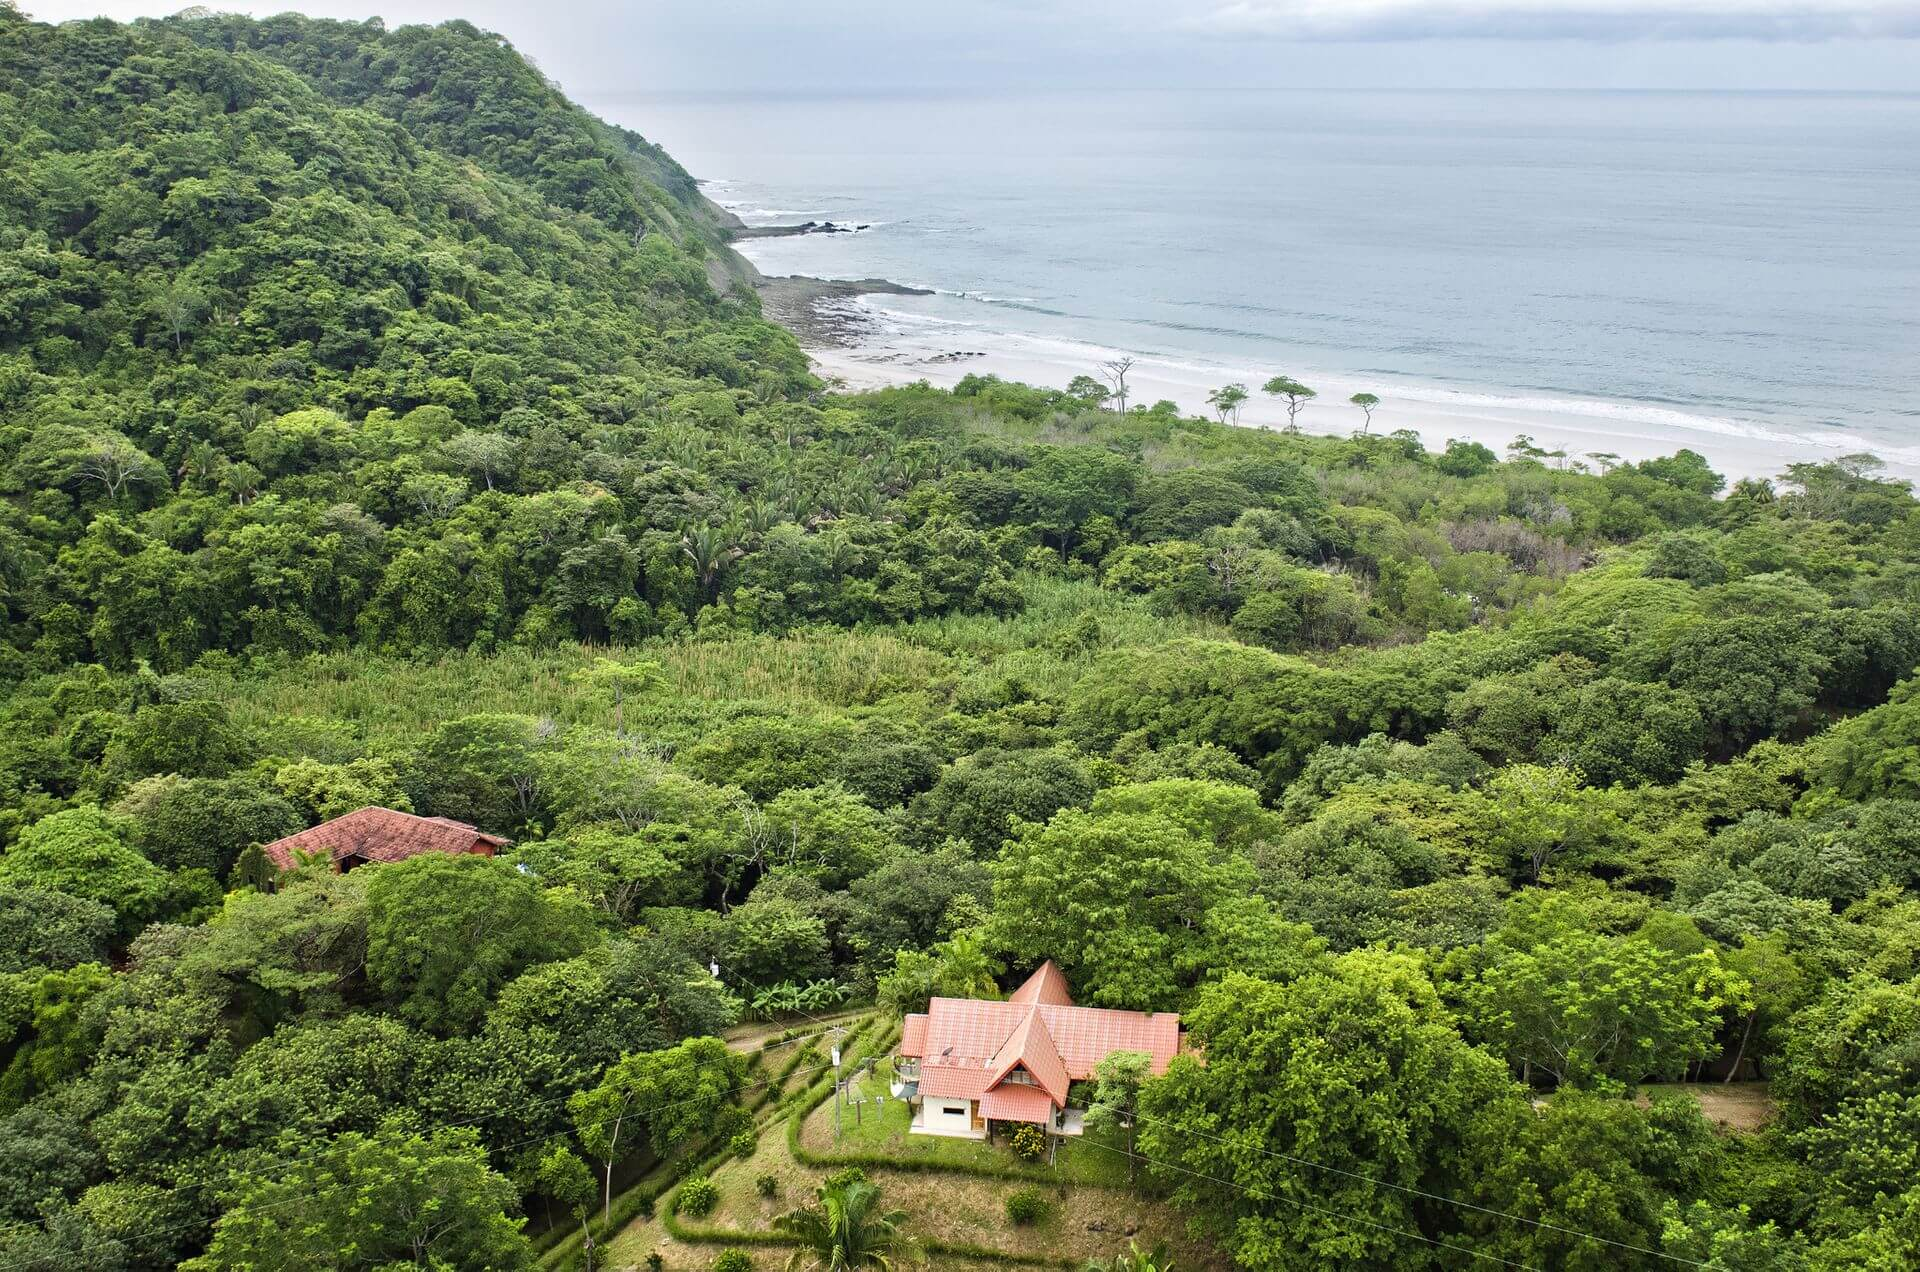 Hacienda Barrigona Accommodation In The Jungle